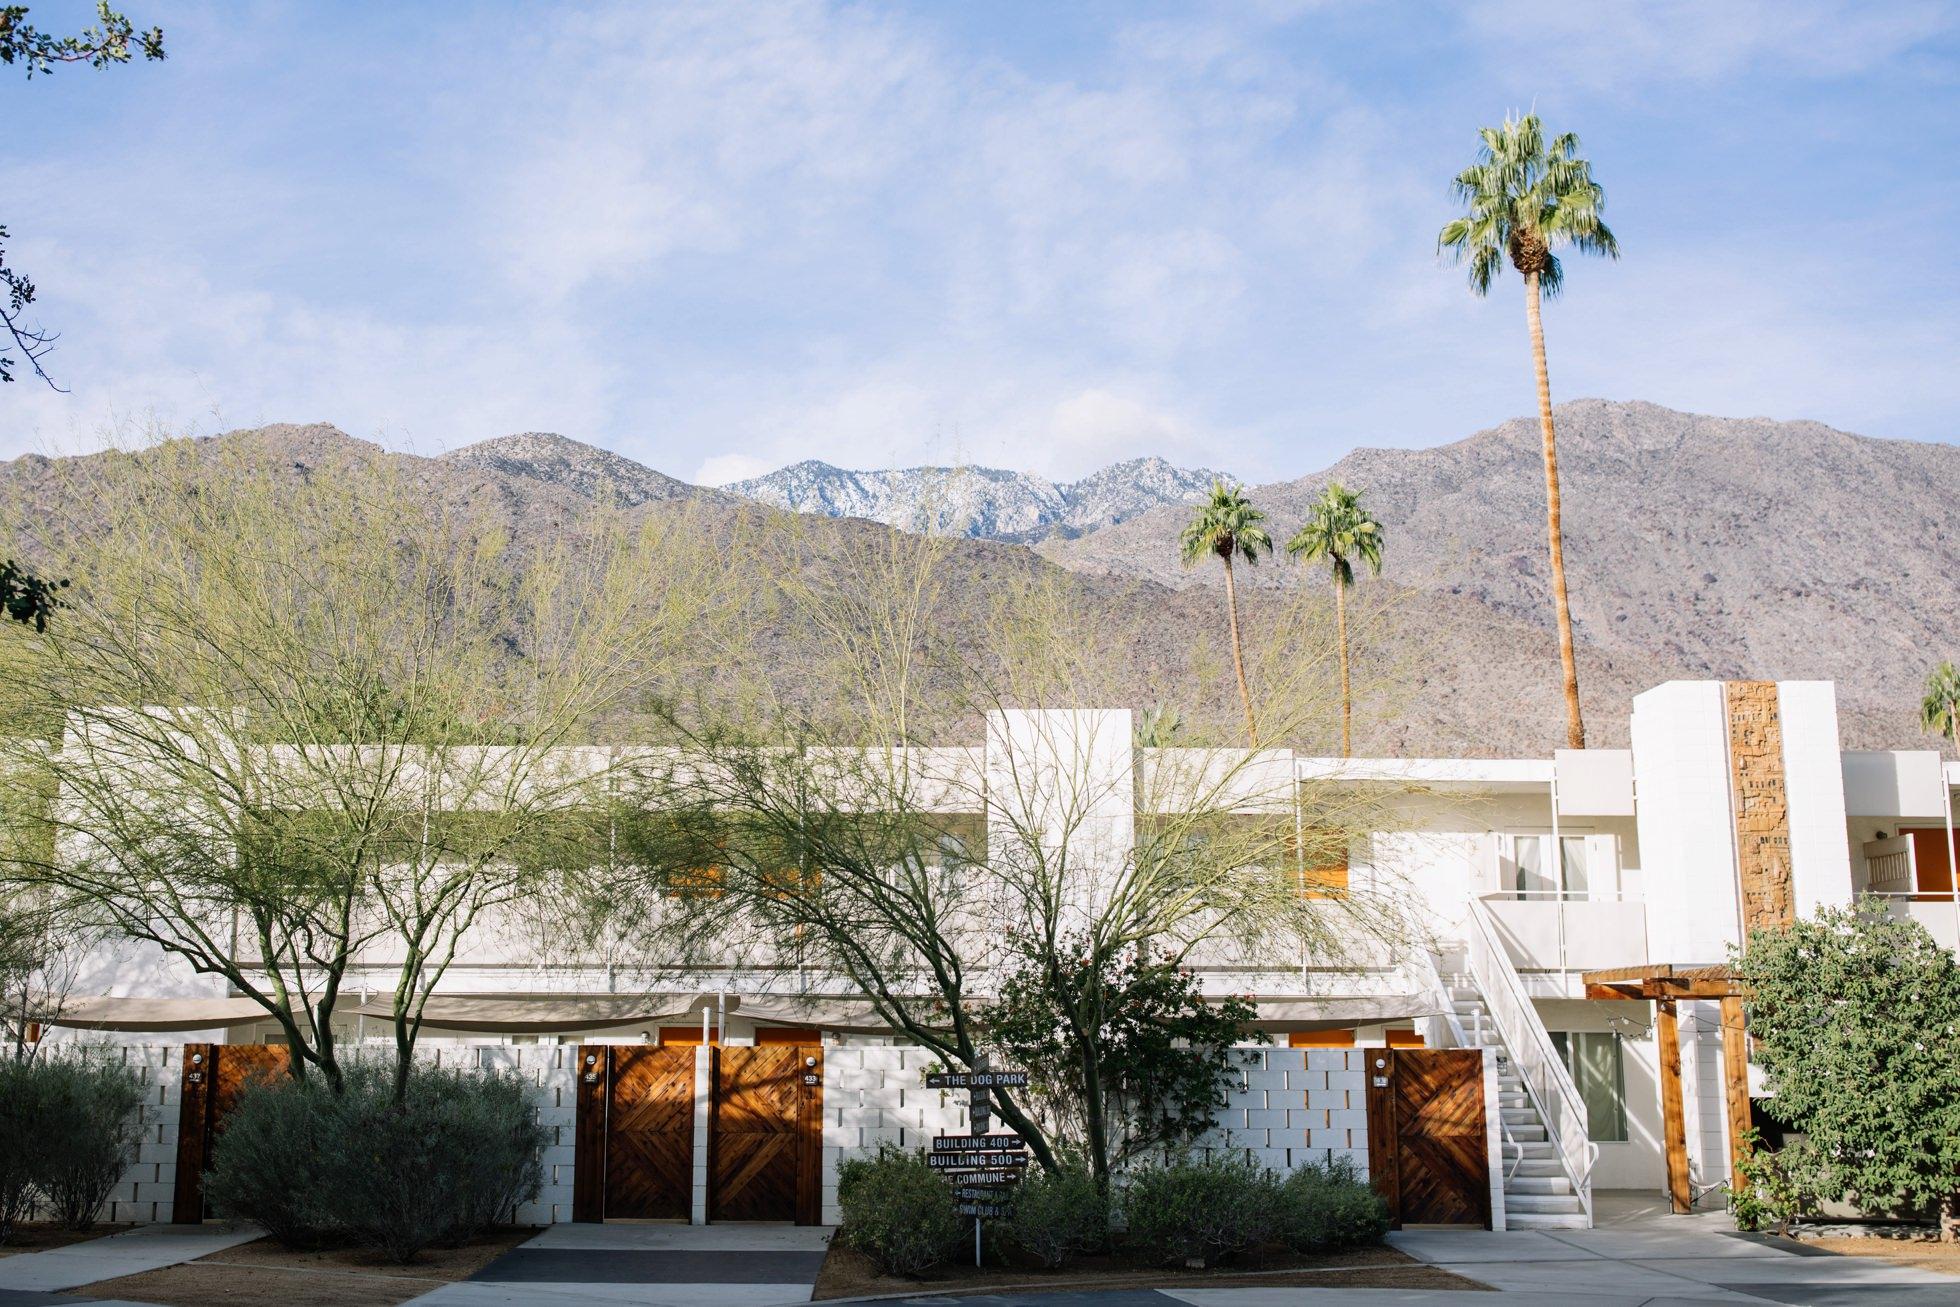 0069-ace-hotel-palm-springs-ca-modern-desert-wedding-location